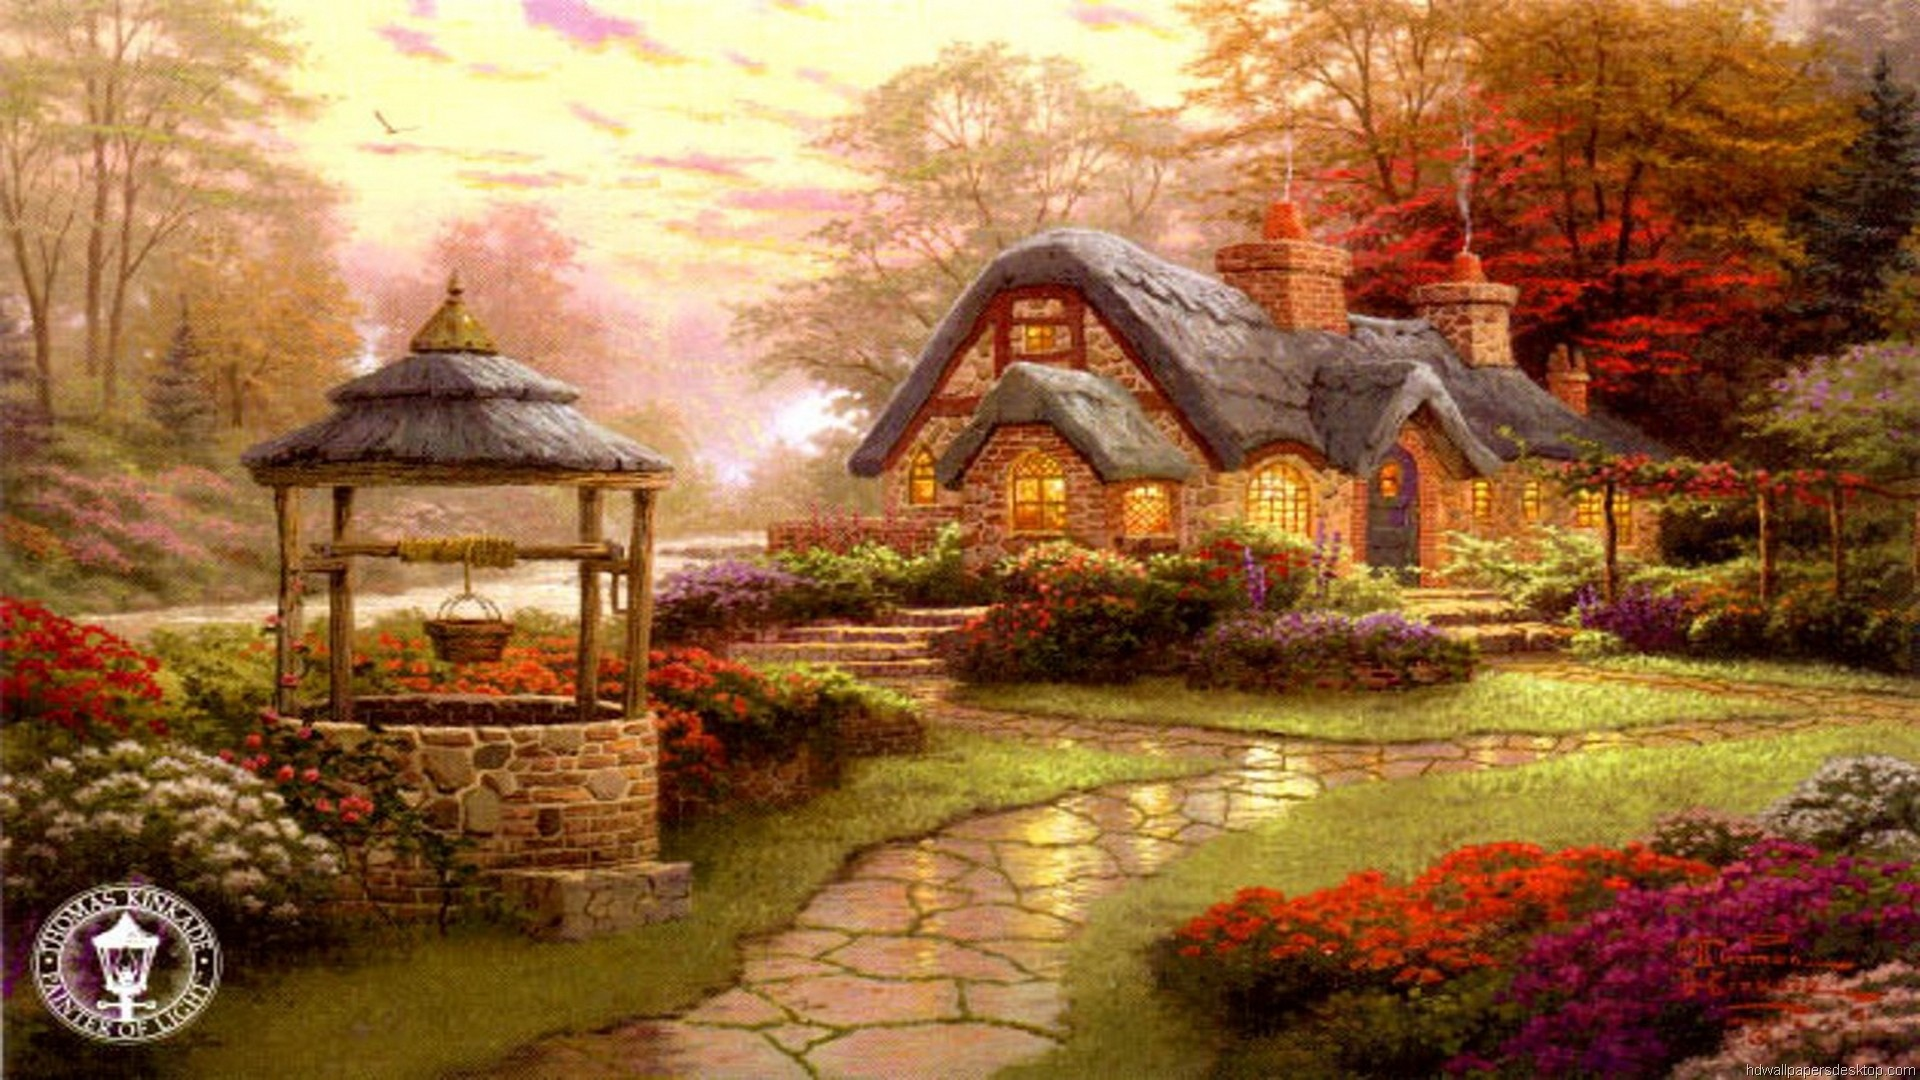 Thomas Kinkade Wallpaper, painting, art, evening, house, Kinkade .